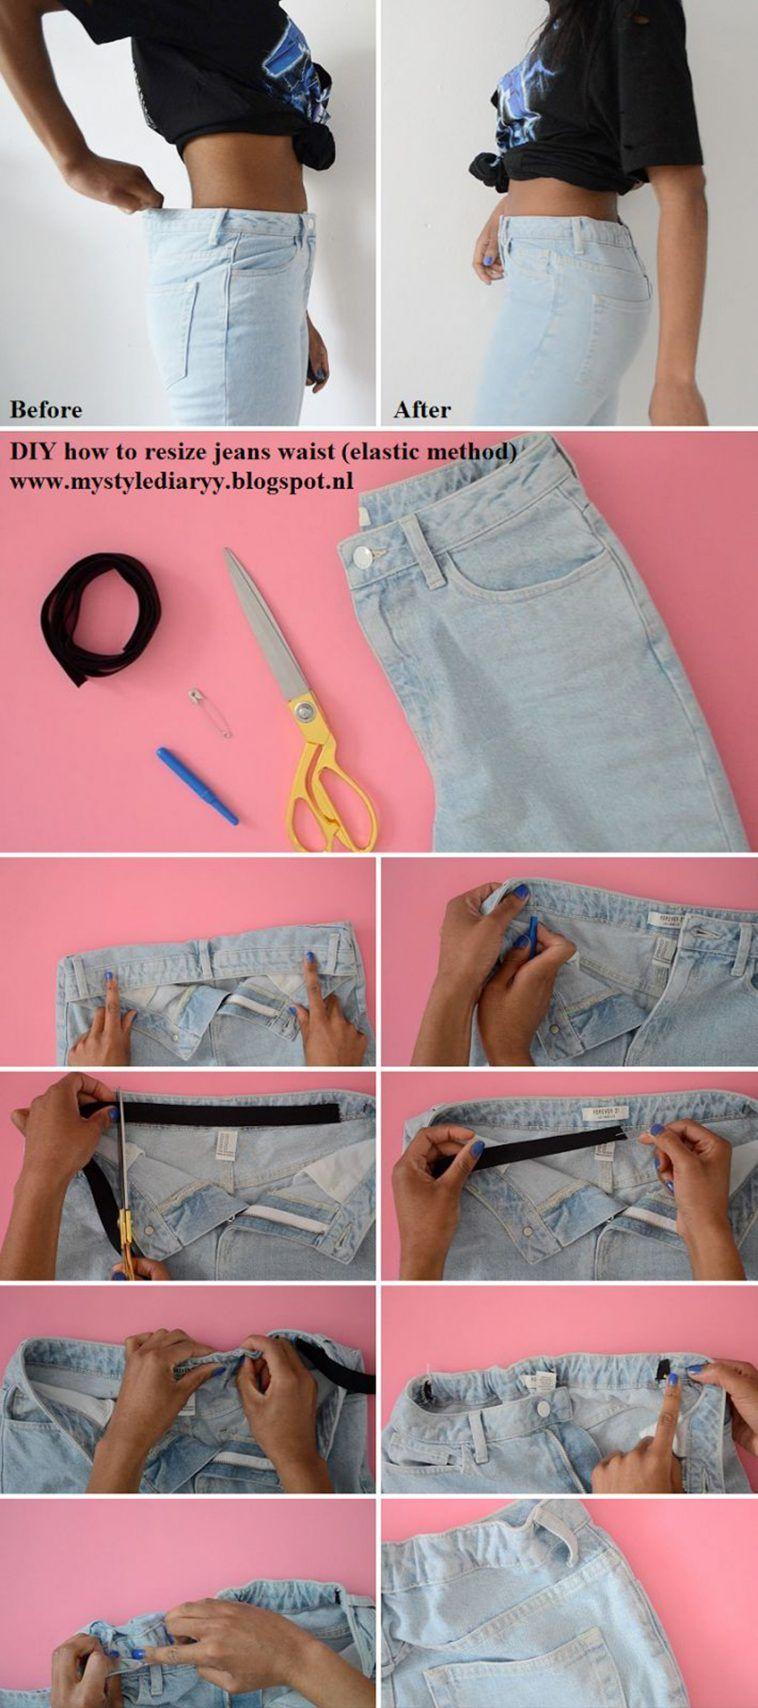 10 Amazing Life Saving Clothing Hacks Every Girl Needs To Know! #diyclothes